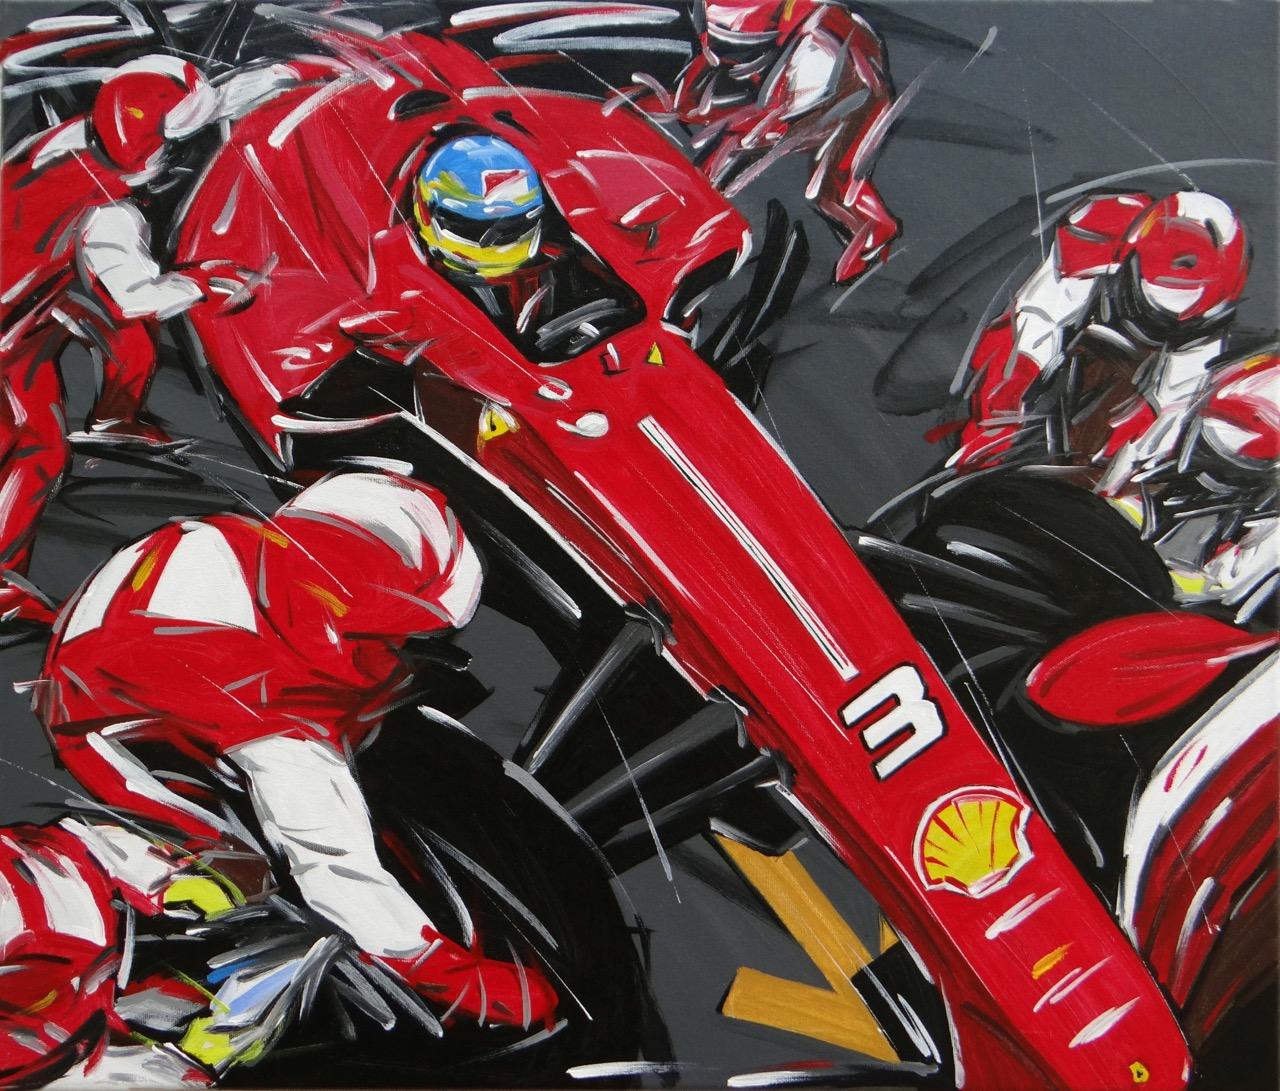 Alonso_Ferrari3_65x76.jpg